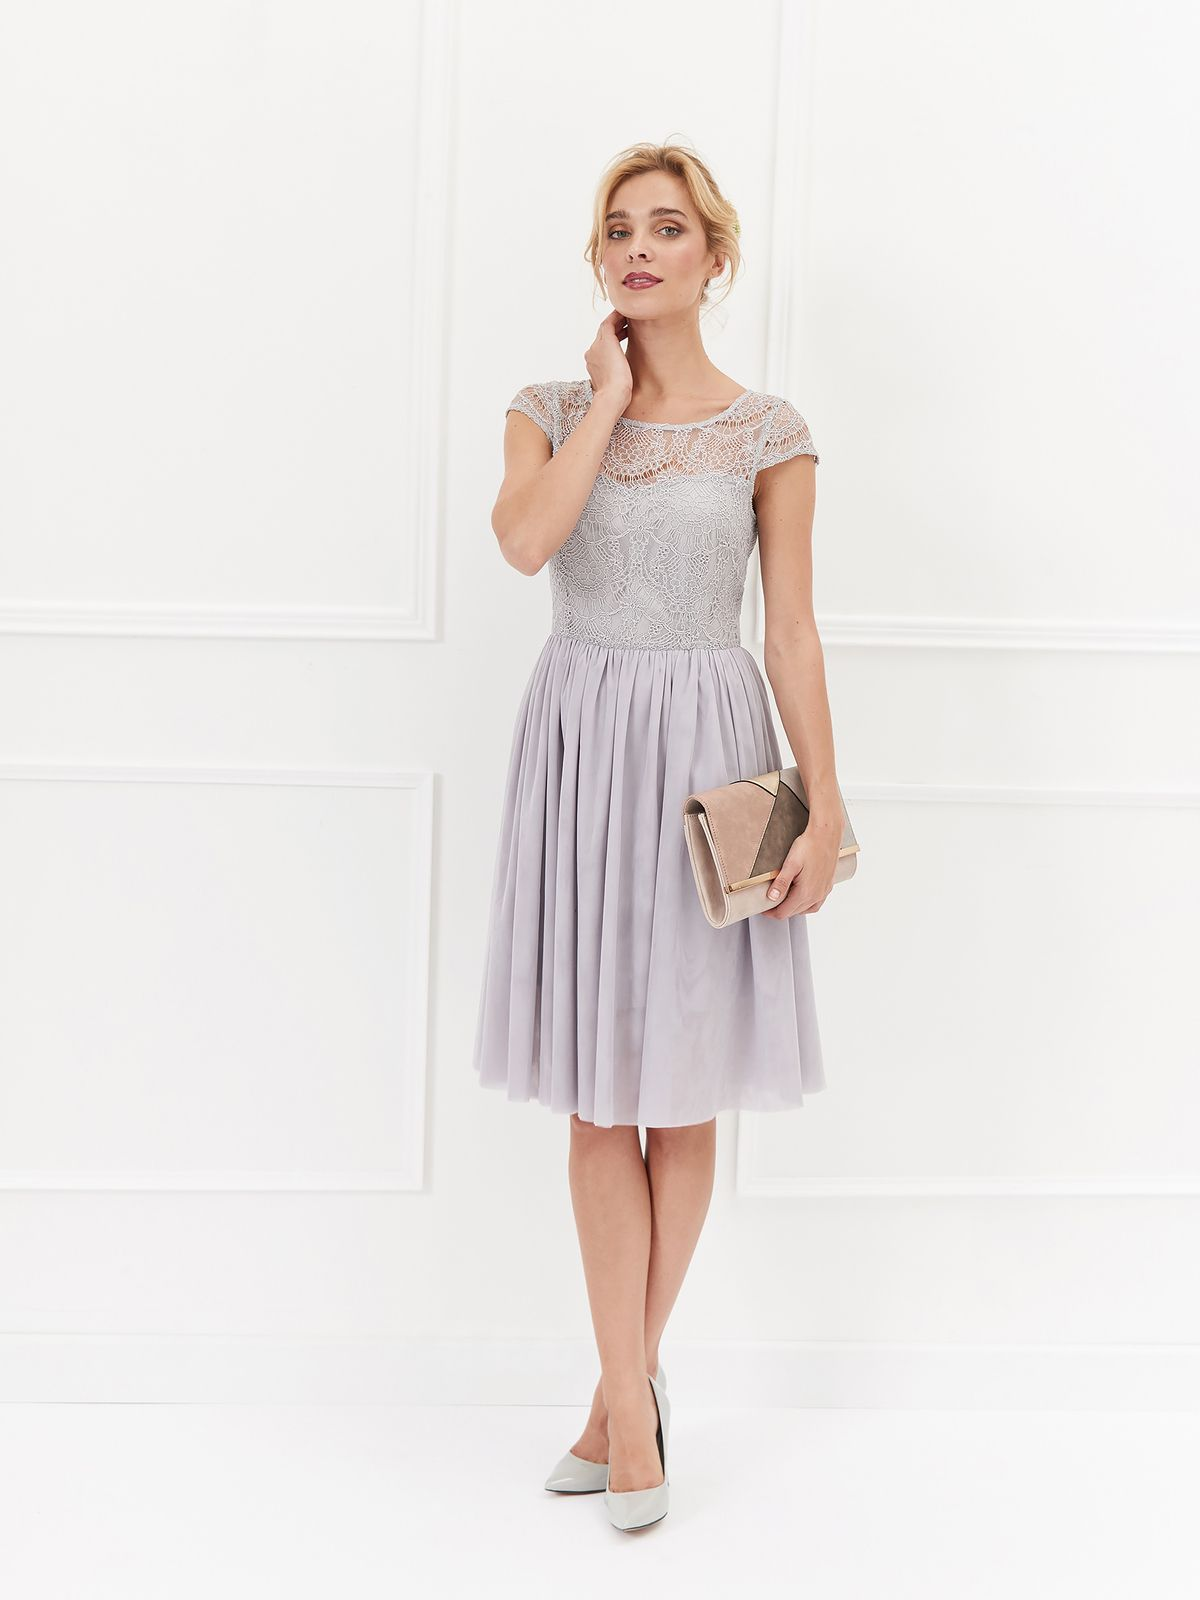 6f51e5164c Top Secret szara sukienka tiulowa na wesele elegancka wedding dress grey  mini prom dress